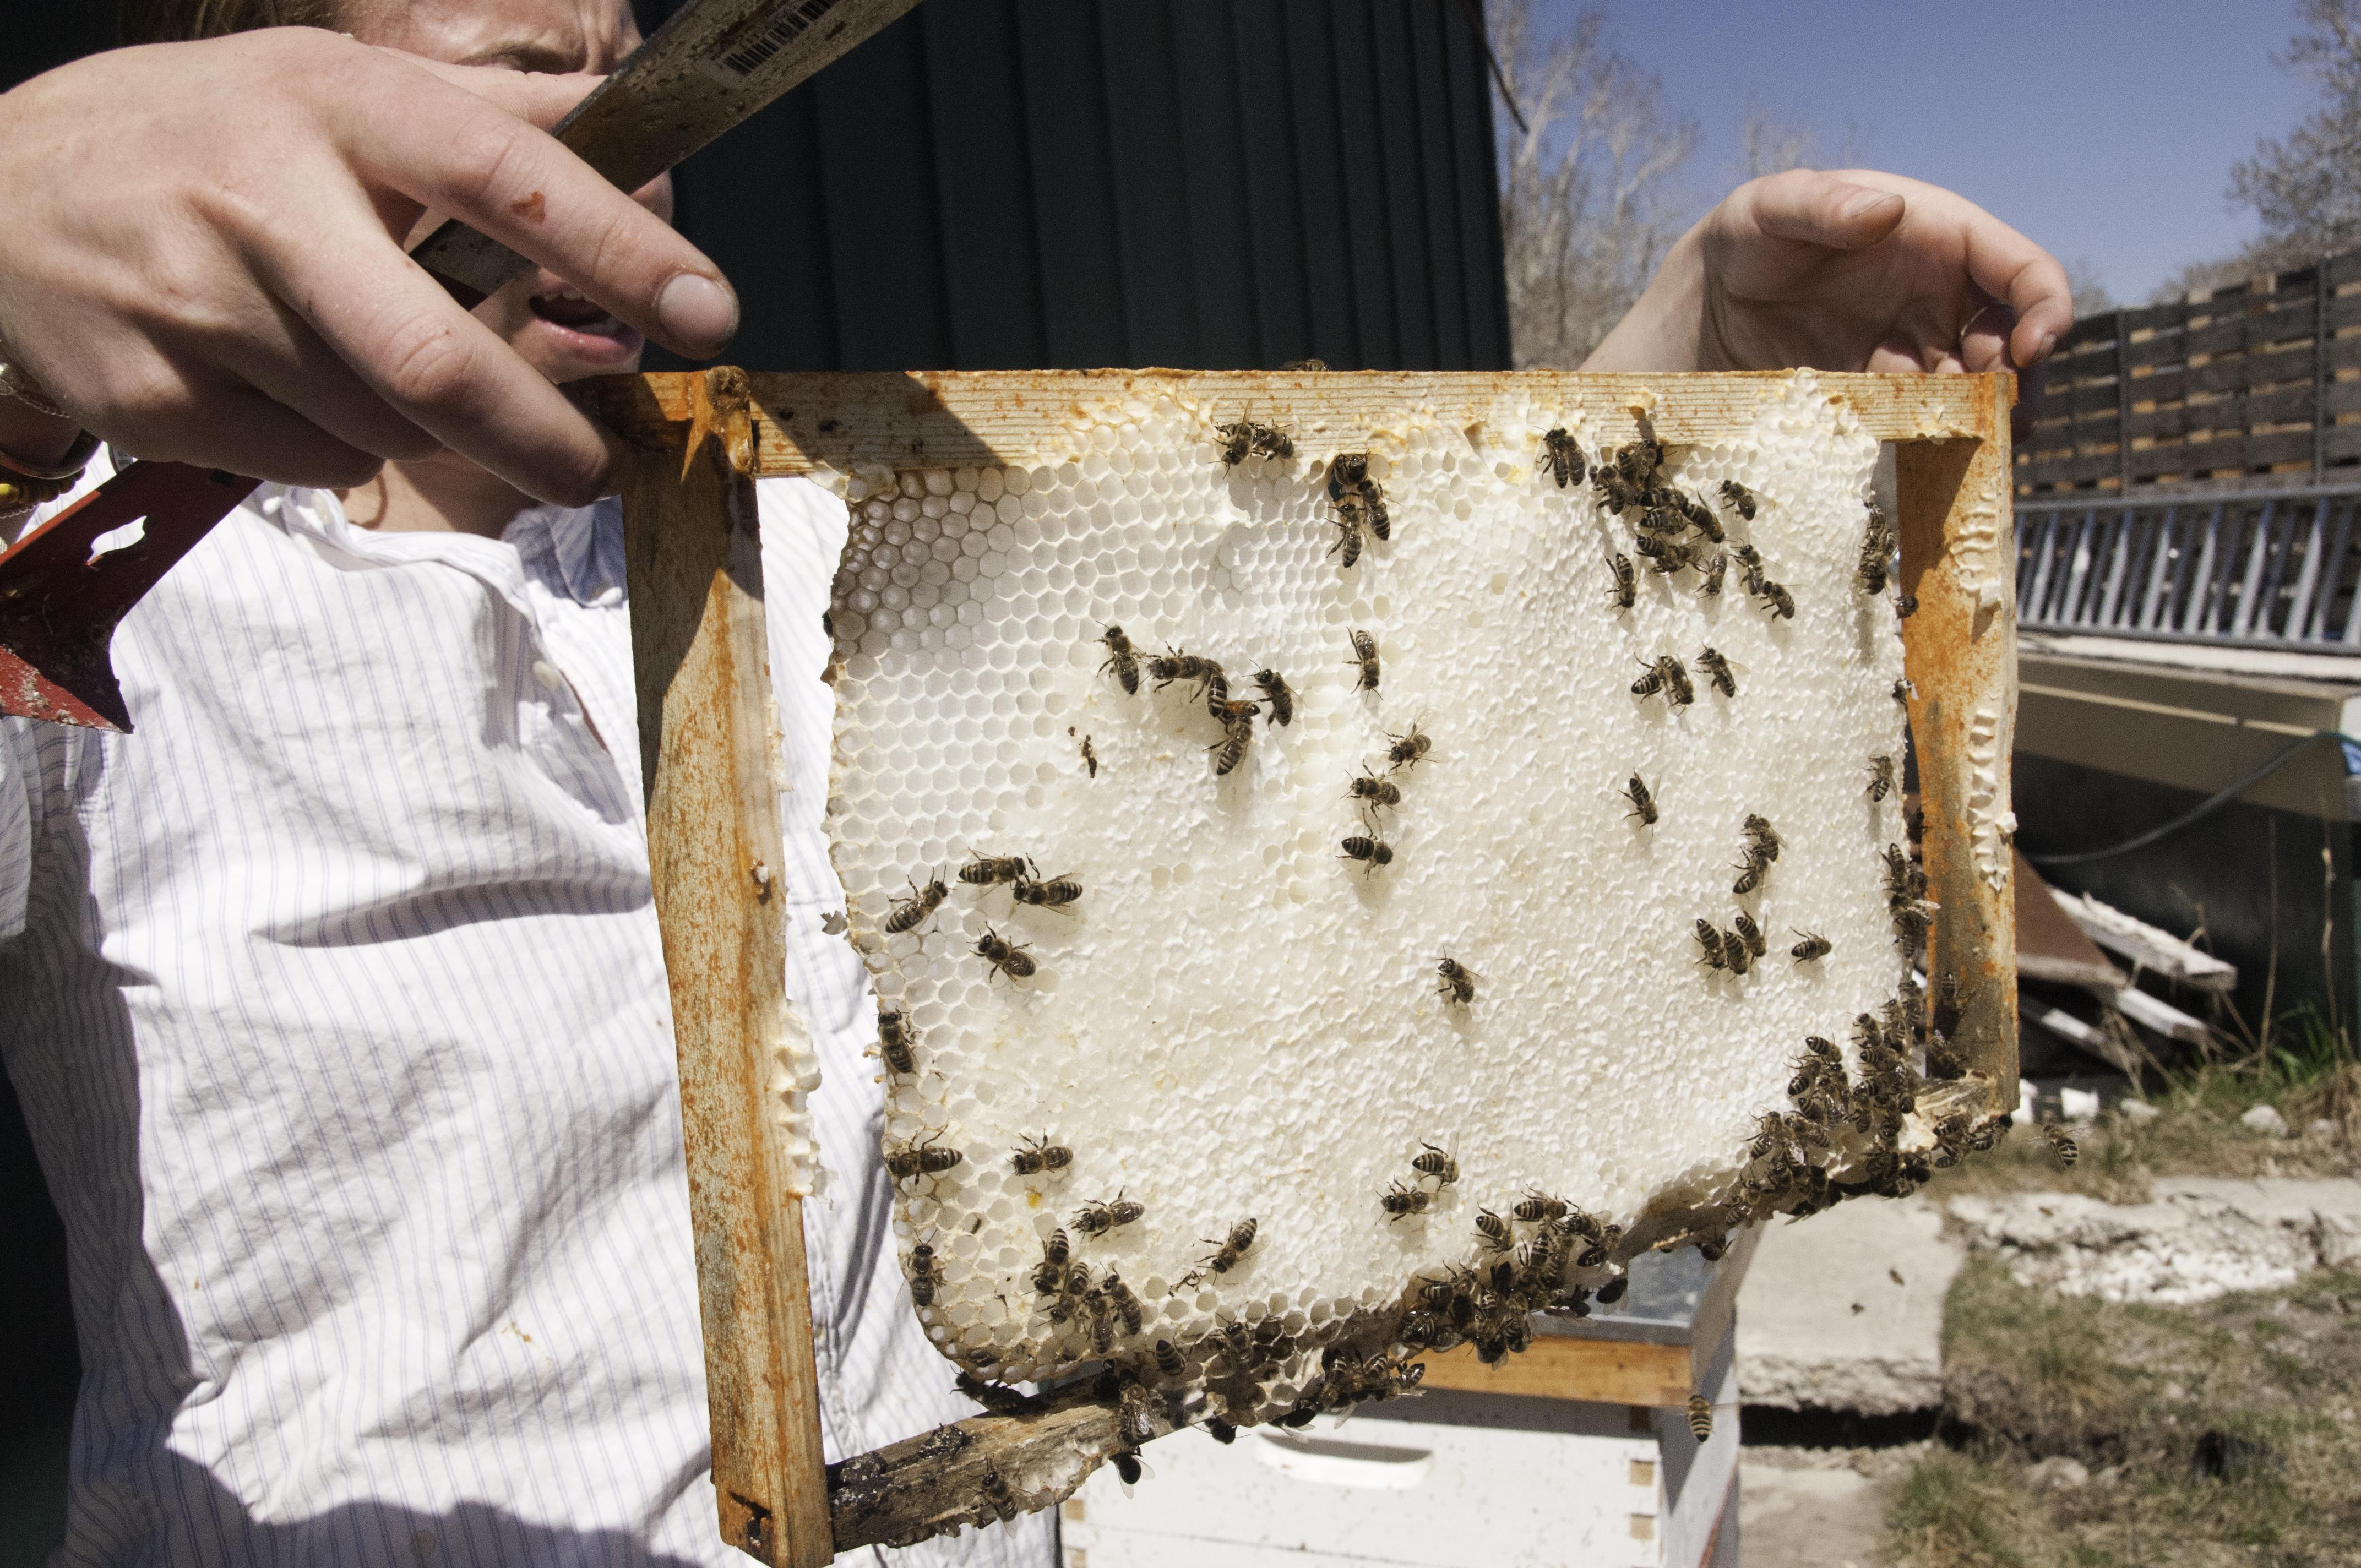 feeders bemis honey farm hive bee feeder wooden top image products